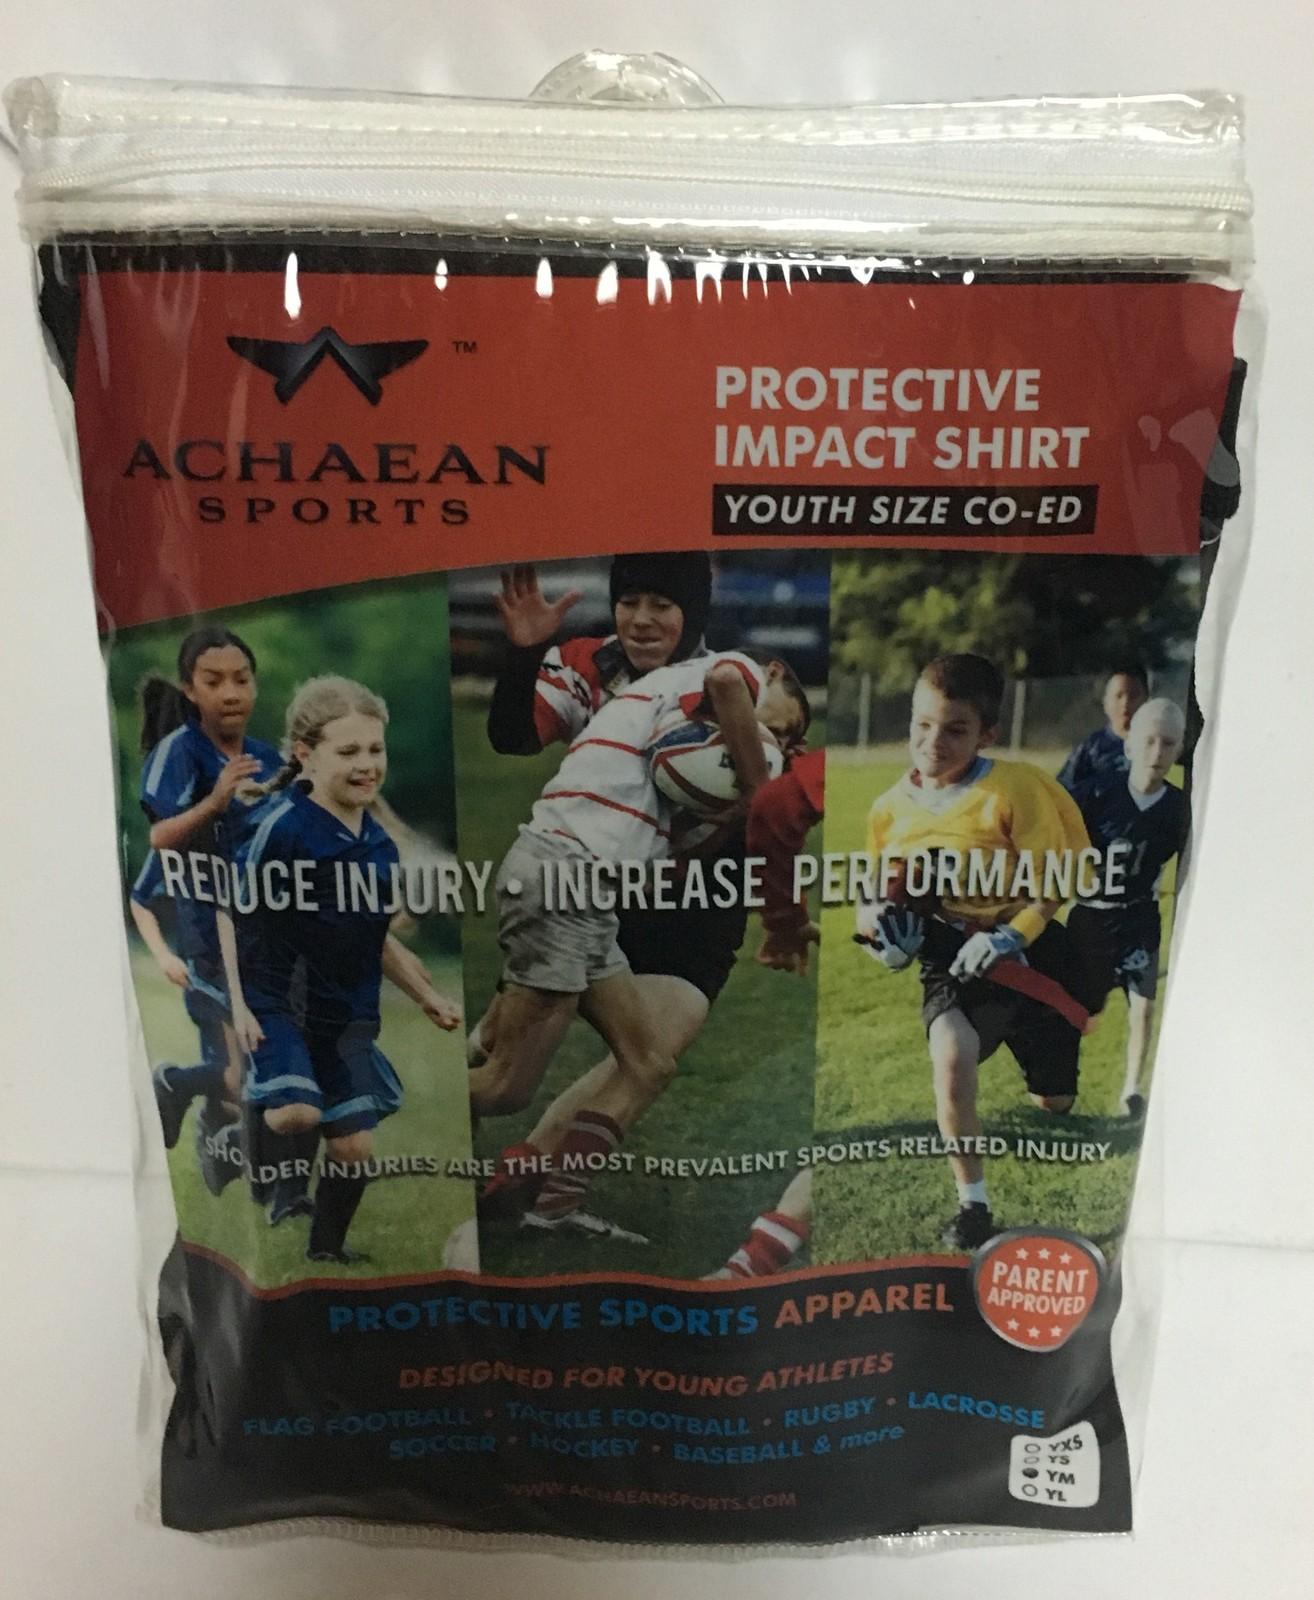 Achaean Sports Protective Impact Shirt Youth Sizes Boys & Girls Black image 2